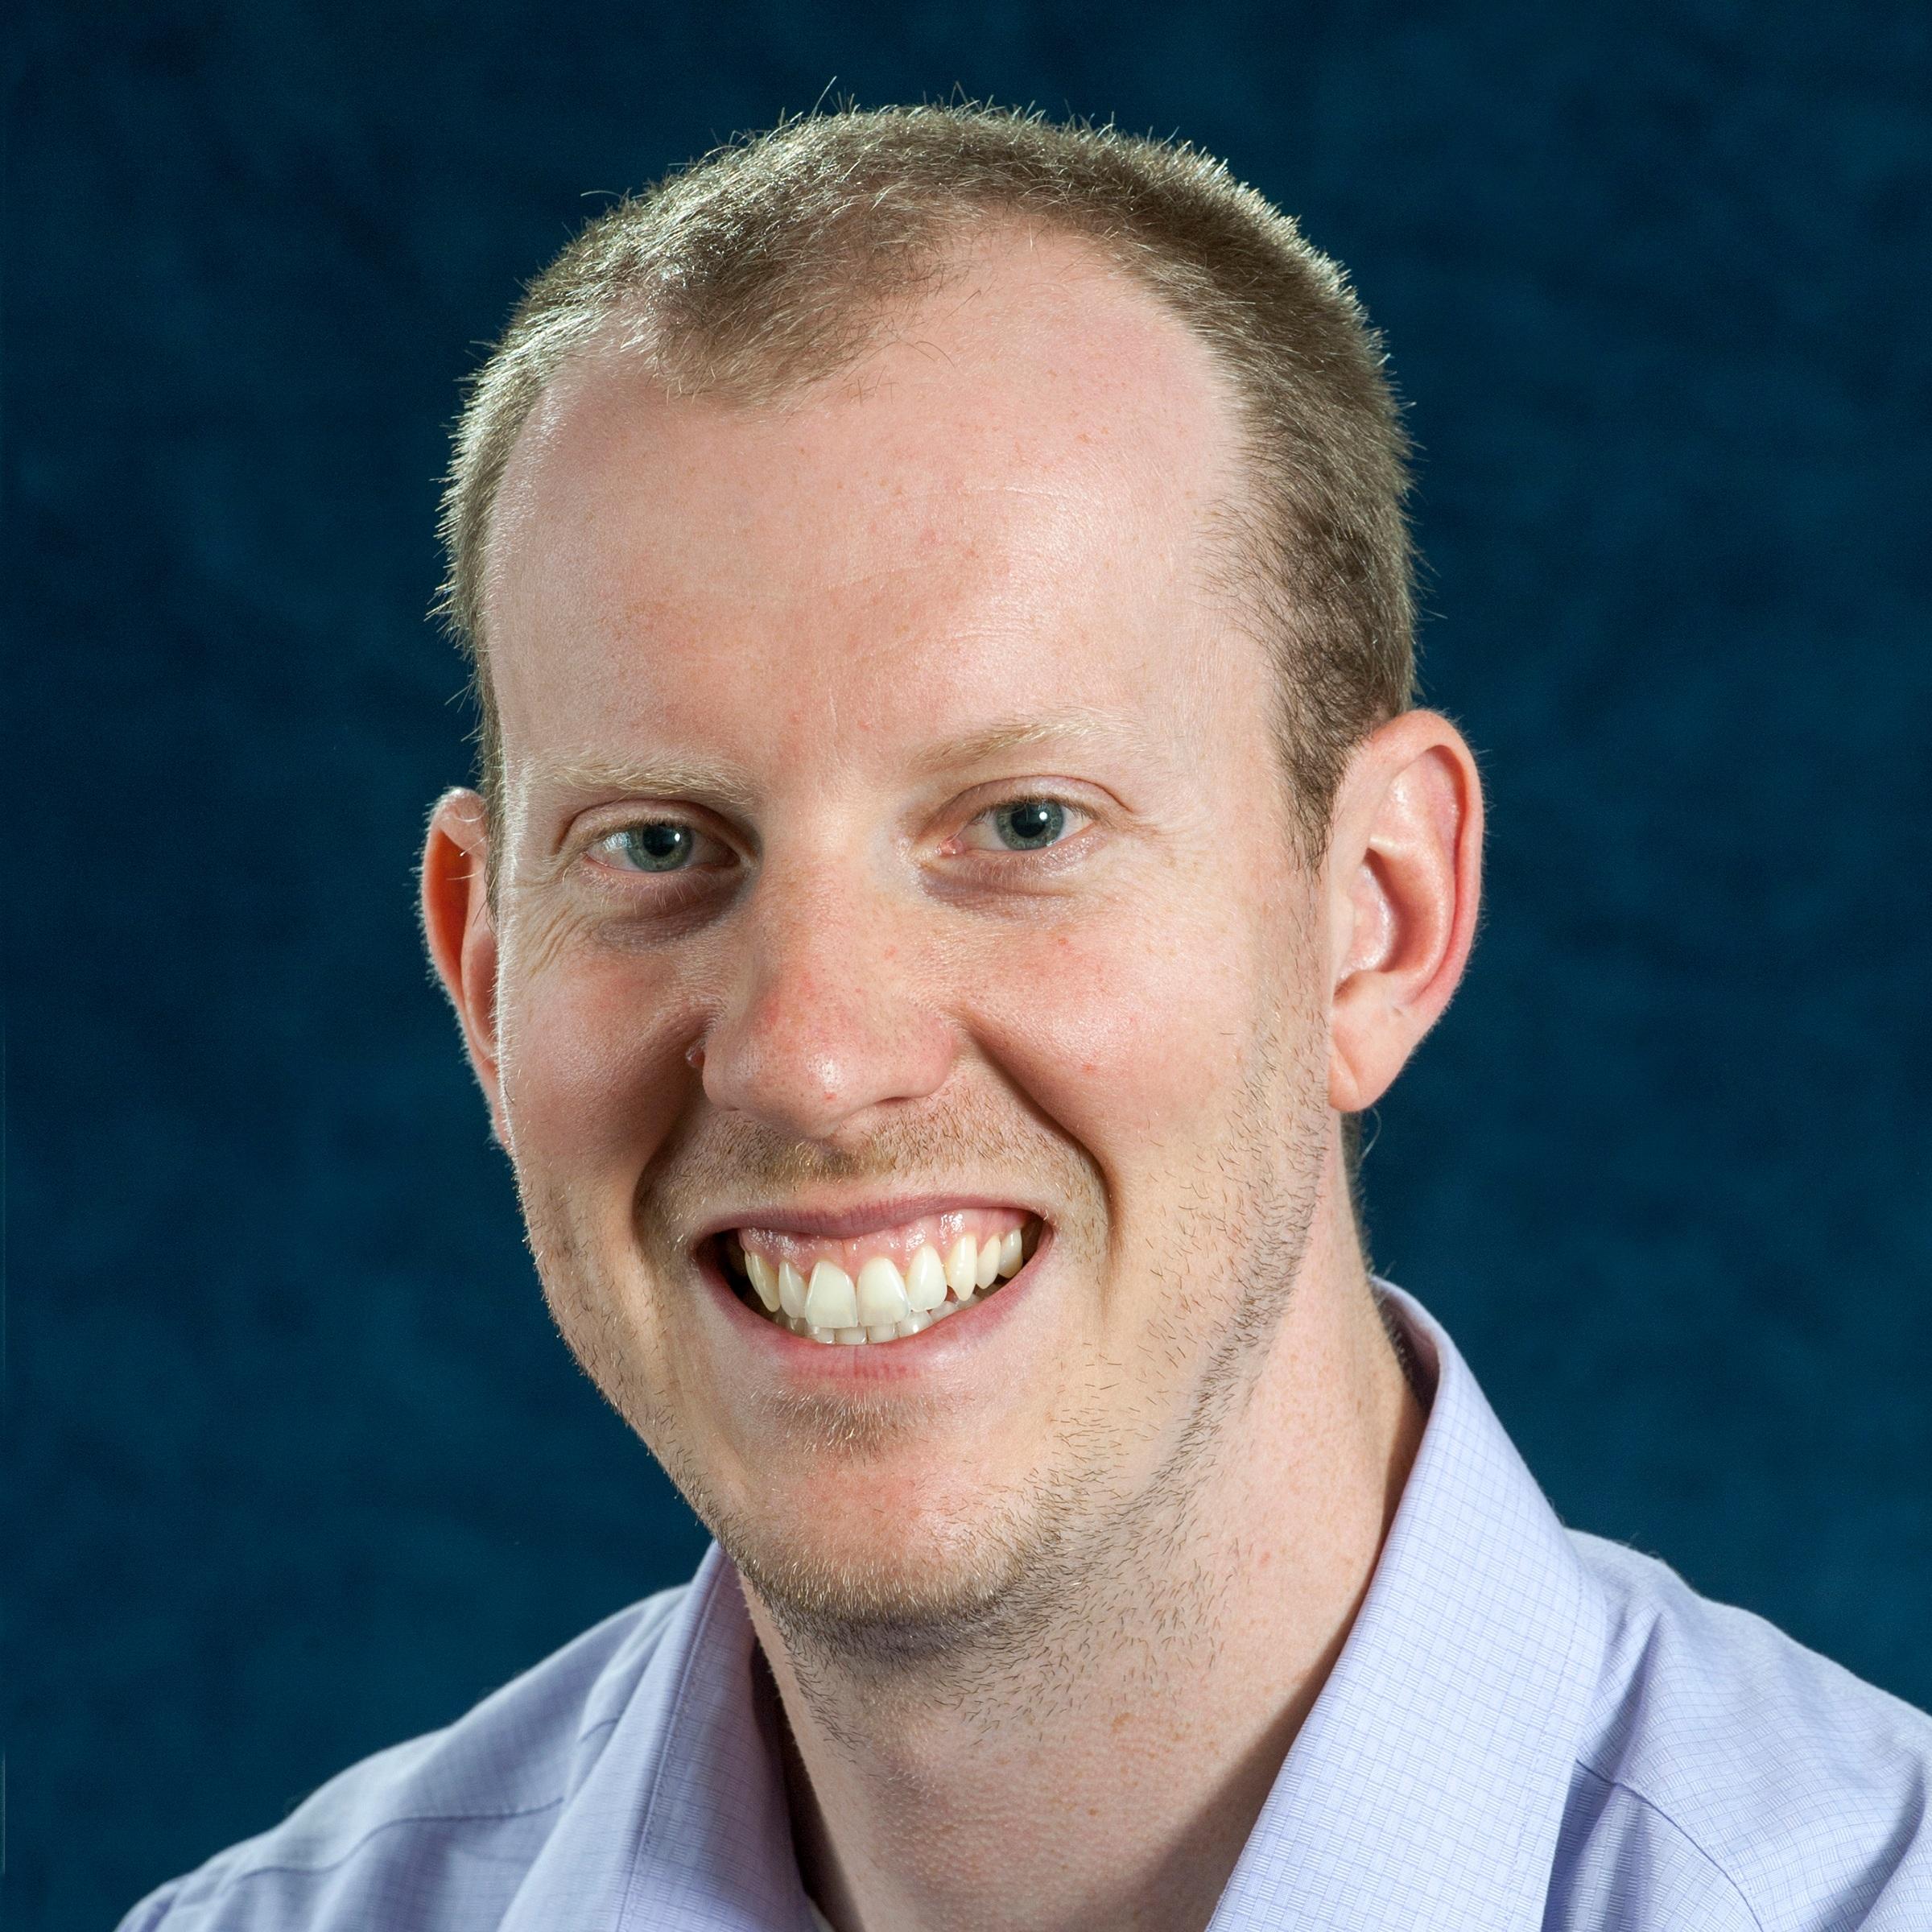 Christopher Frye, DVM, DACVSMR - Assistant Clinical Professor & Section Chief, Sports Medicine & Rehabilitation, Cornell University College of Veterinary Medicine